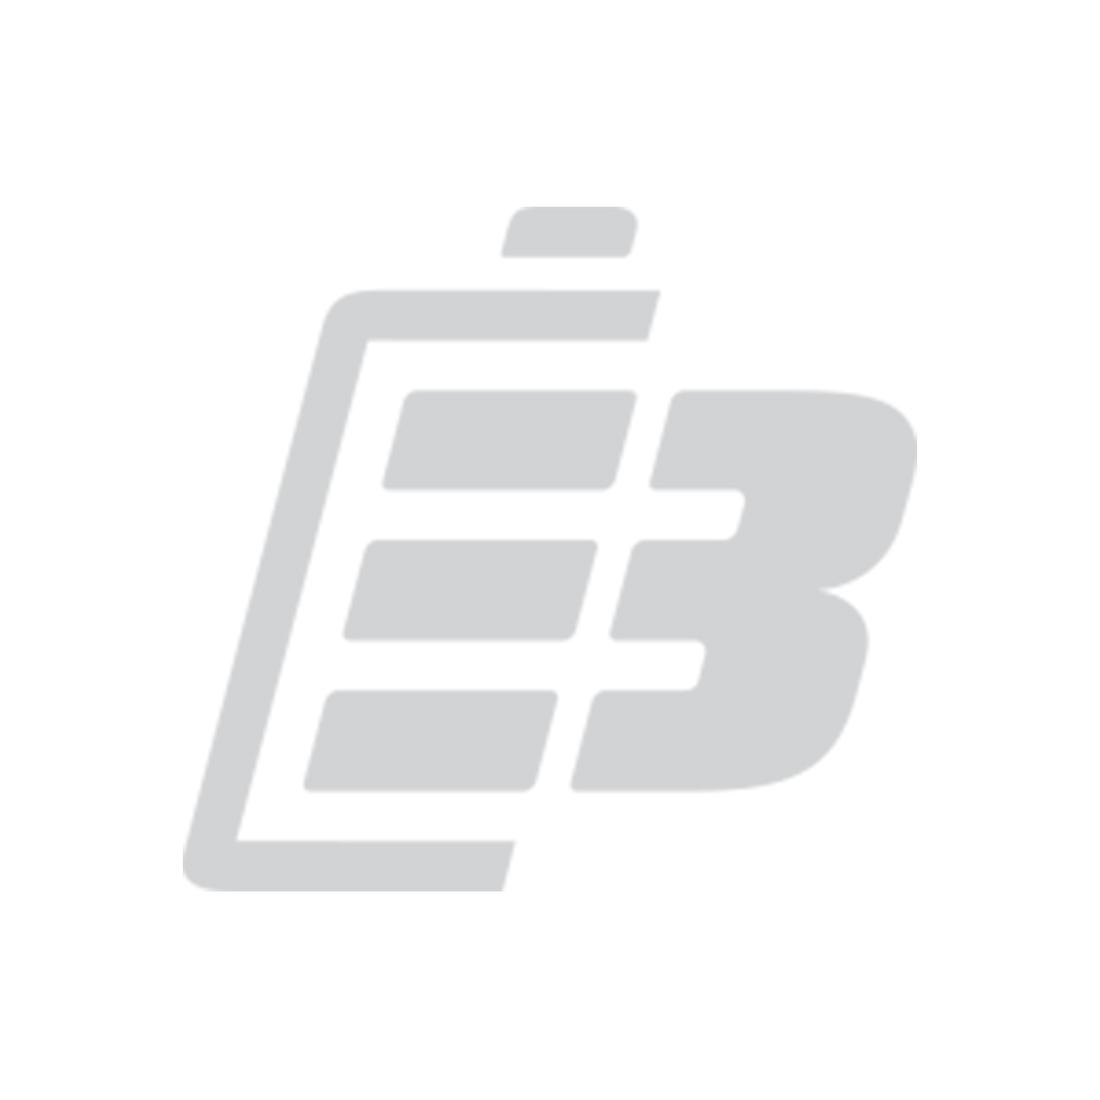 Choetech Lightning to USB Black Cable 1.2m_1